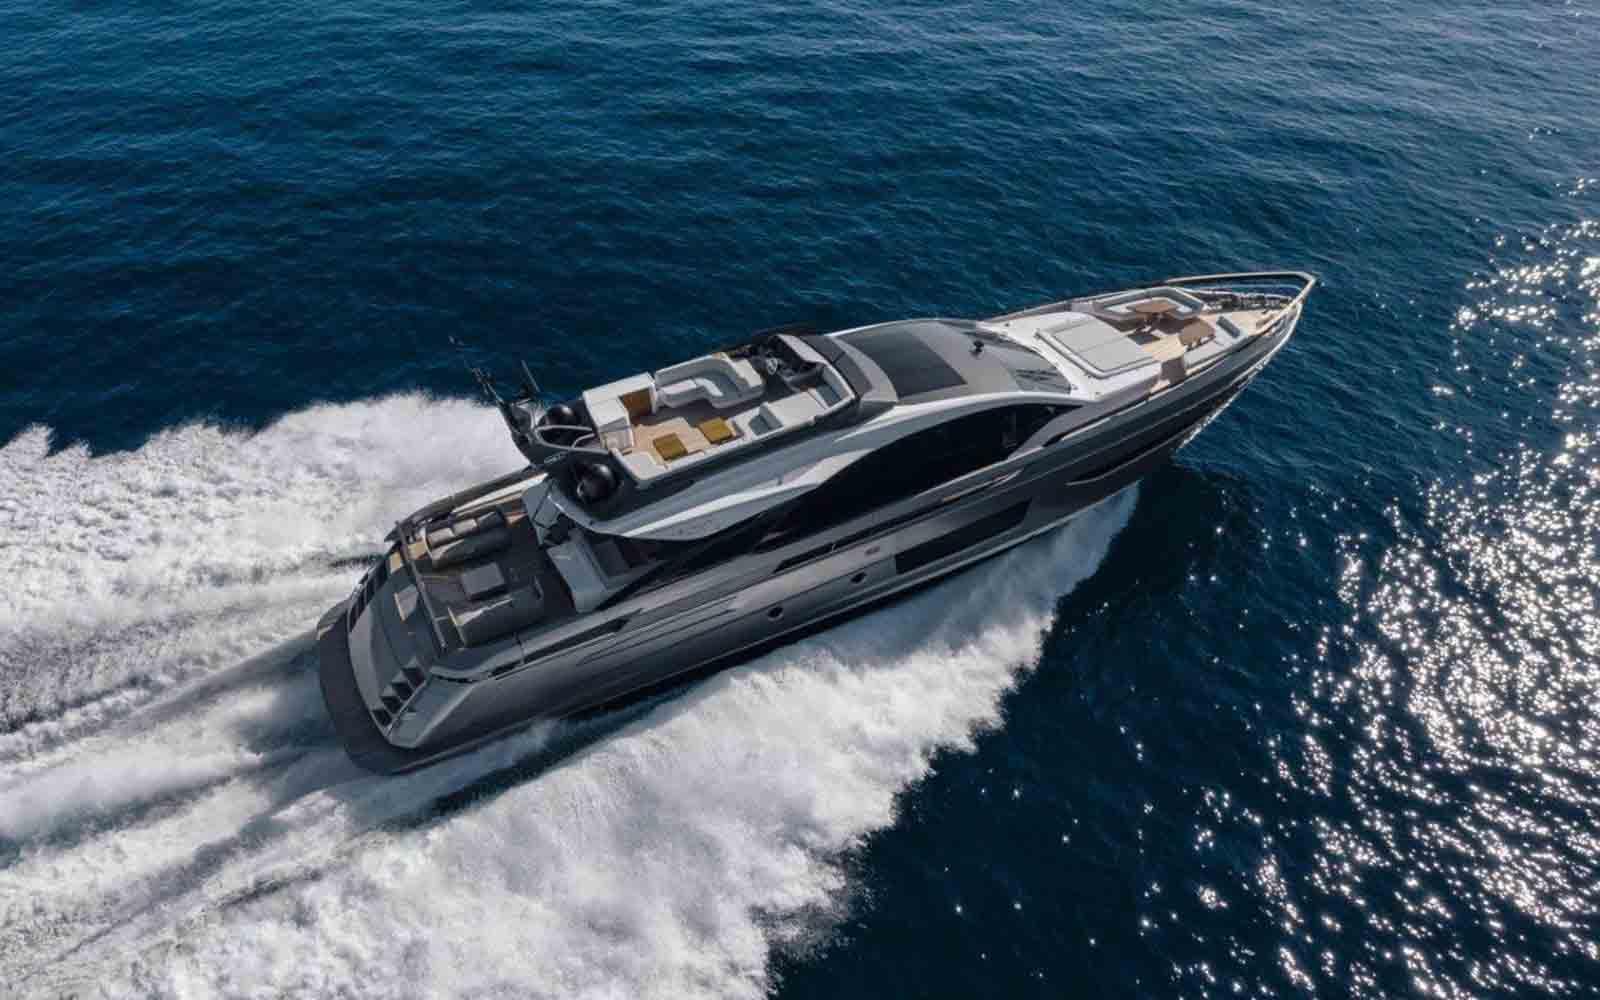 Azimut Grande S10 - boat shopping 19